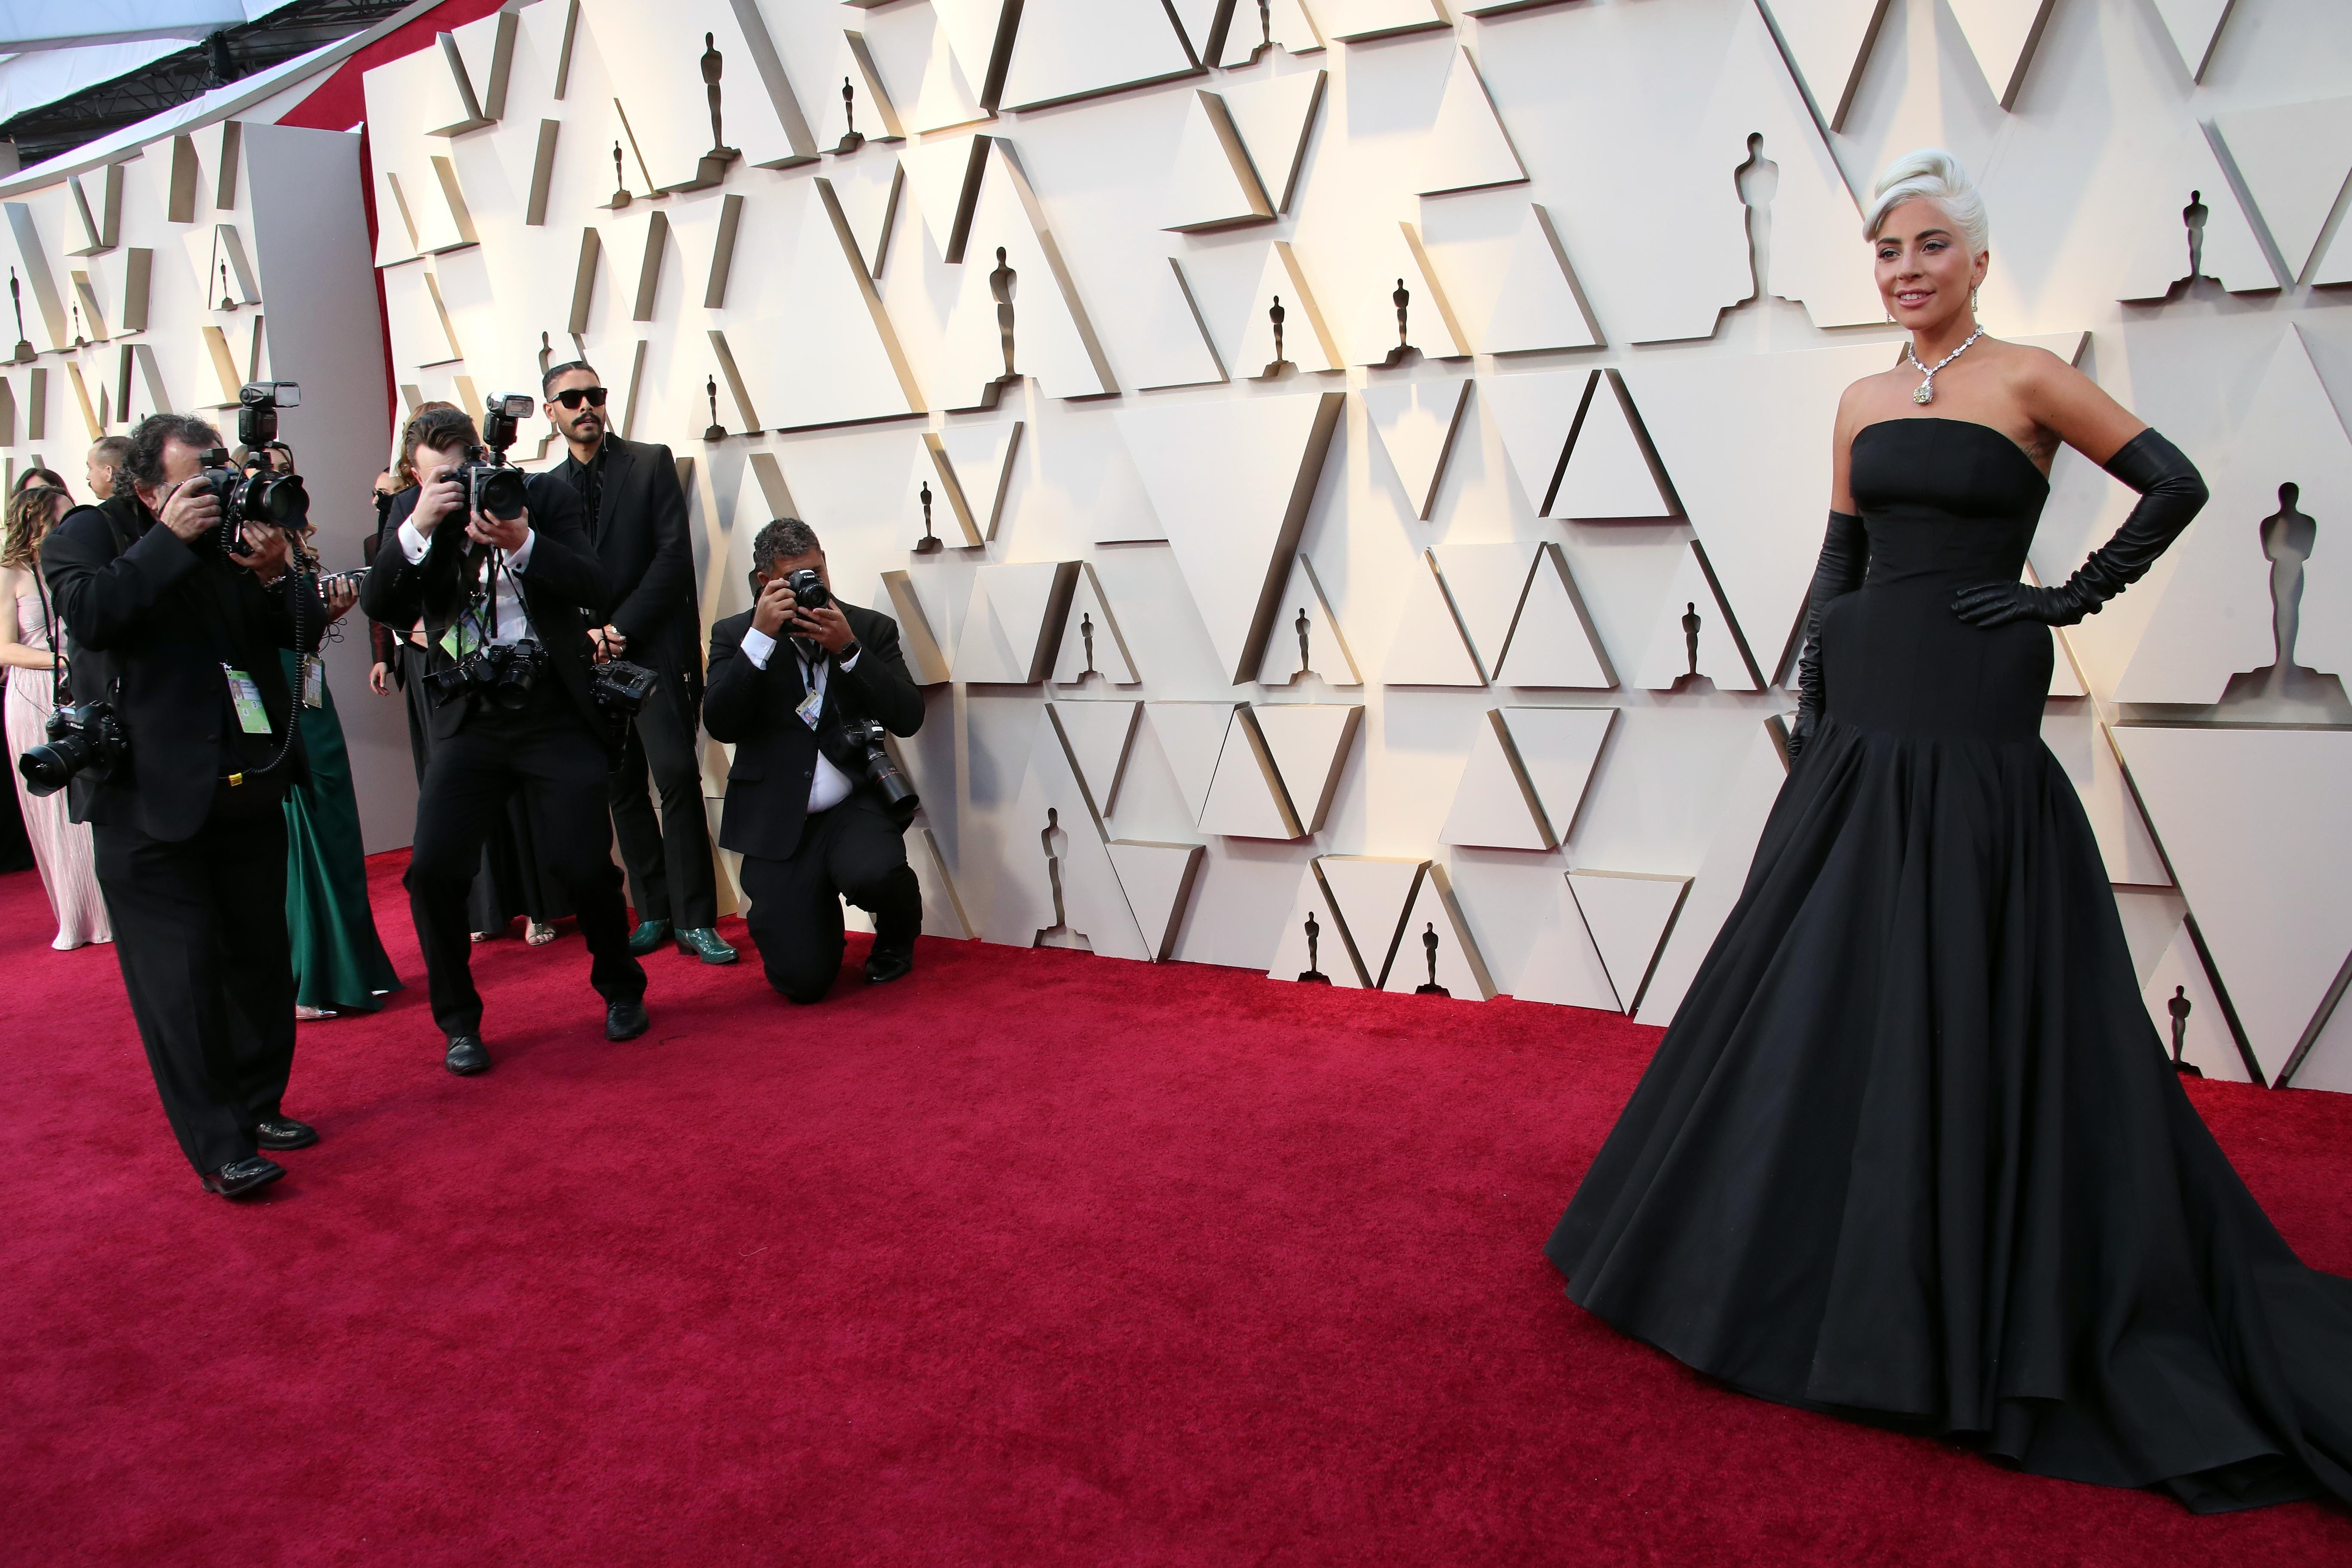 February 24, 2019; Los Angeles, CA, USA; Lady Gaga arrives at the 91st Academy Awards at the Dolby Theatre. Mandatory Credit: Dan MacMedan-USA TODAY NETWORK